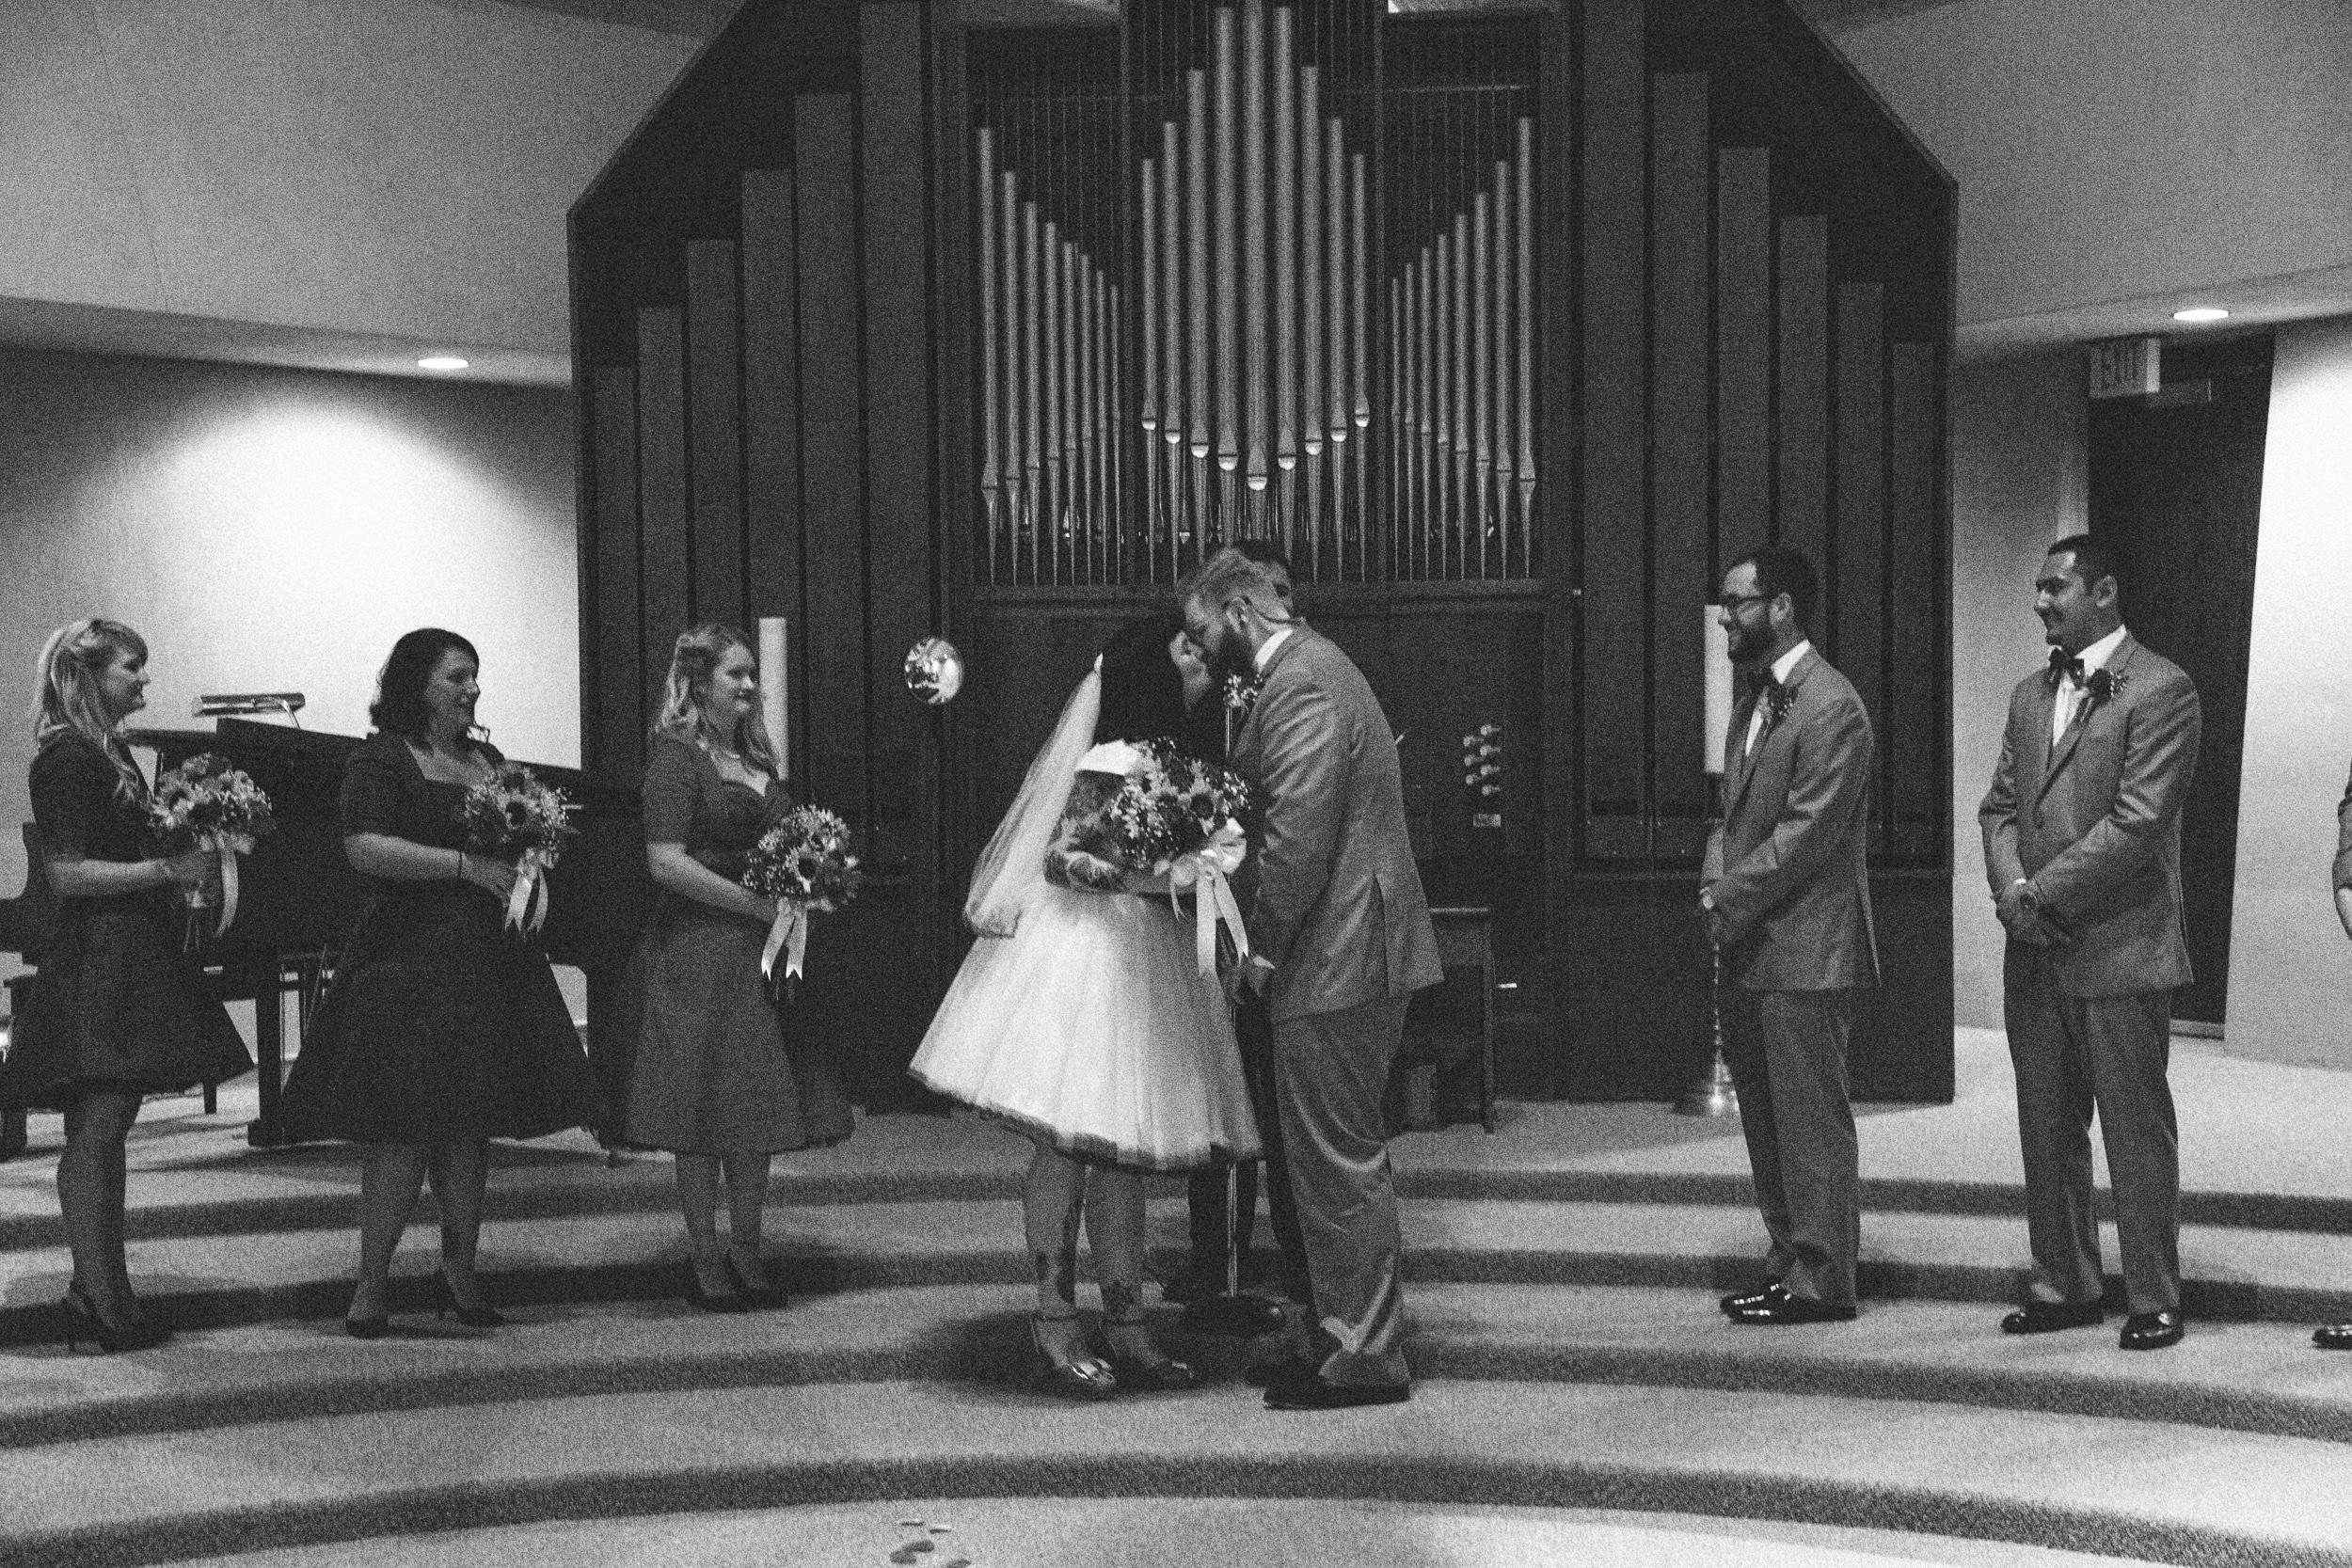 Christian & Sarah wedding photography by Brian milo-172.jpg